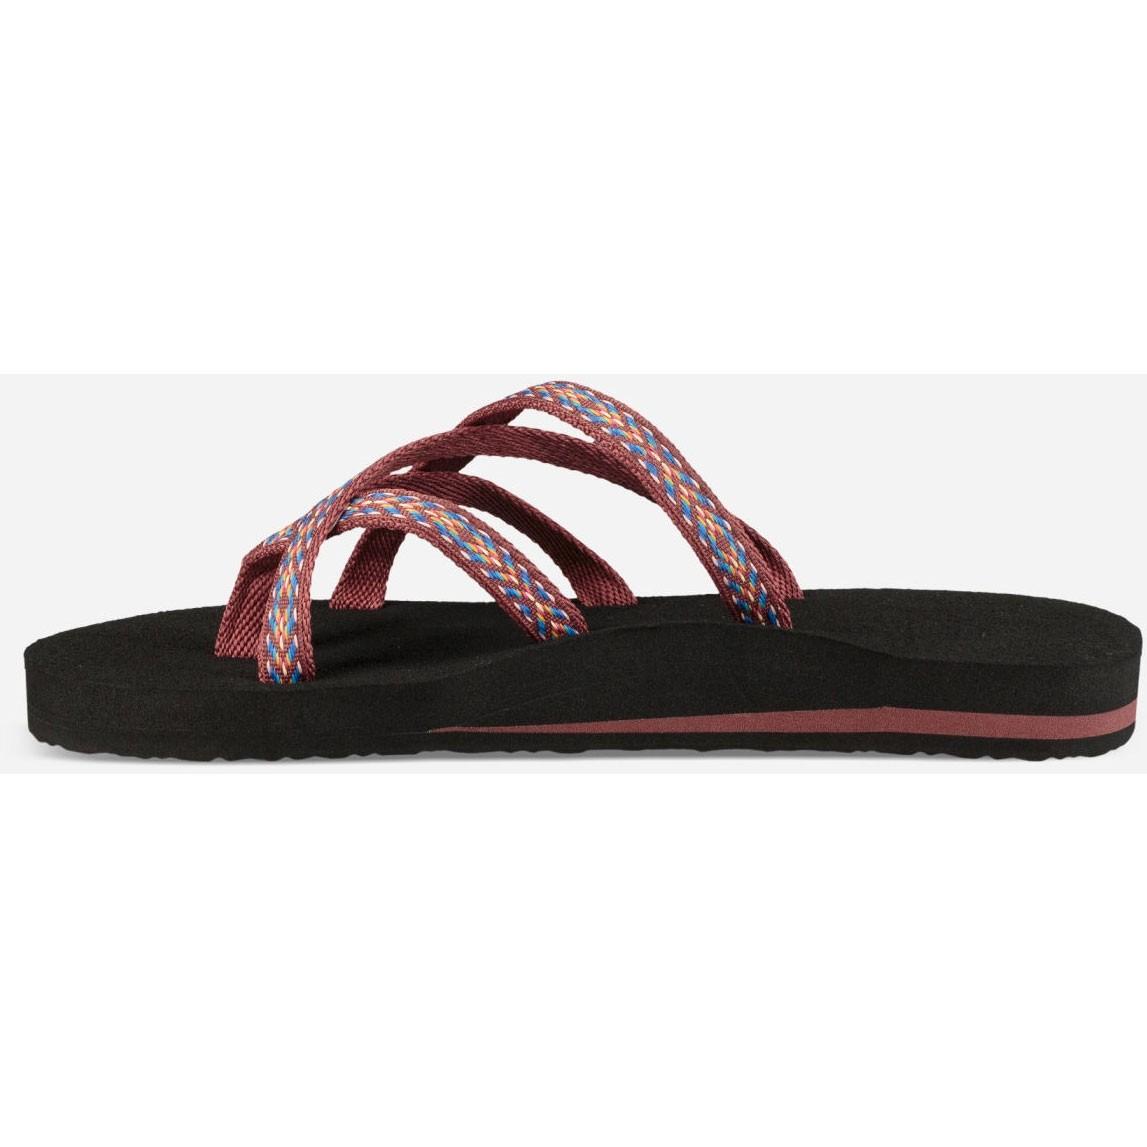 TEVA - Olowahu Women's Flip Flop Sandal - Himalaya Port